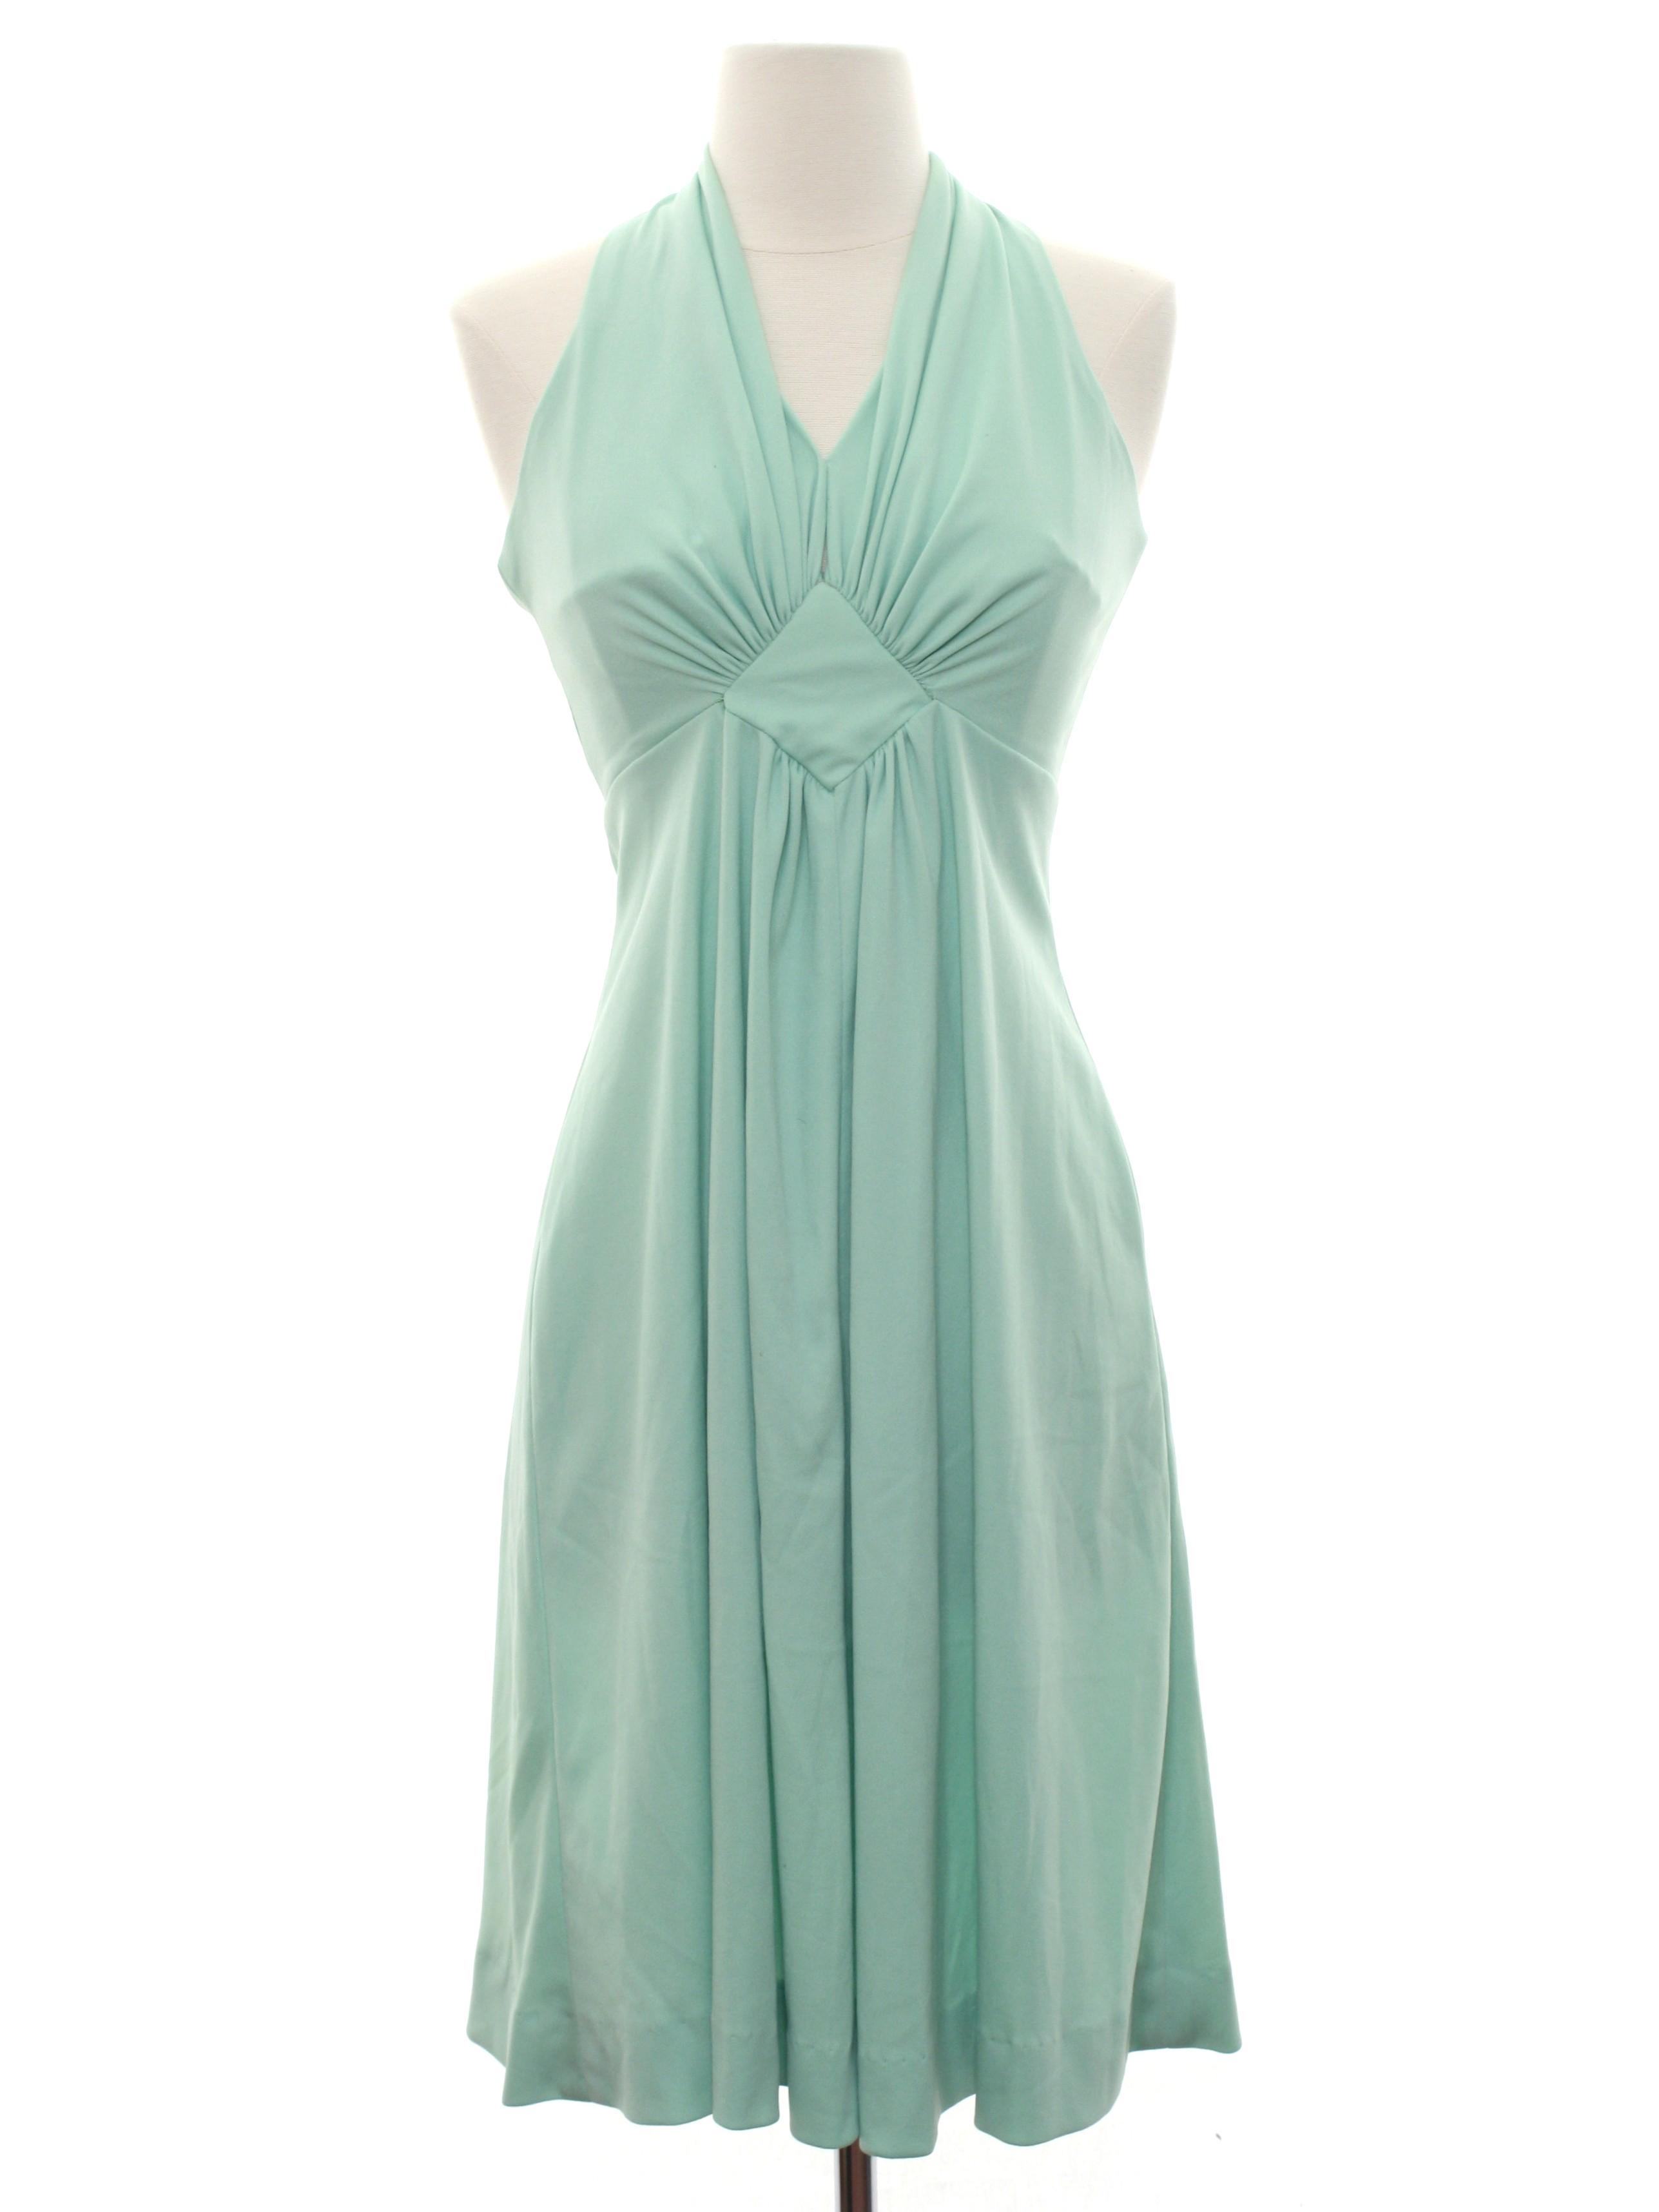 Retro 70\'s Cocktail Dress: 70s -No Label- Womens mint green slinky ...